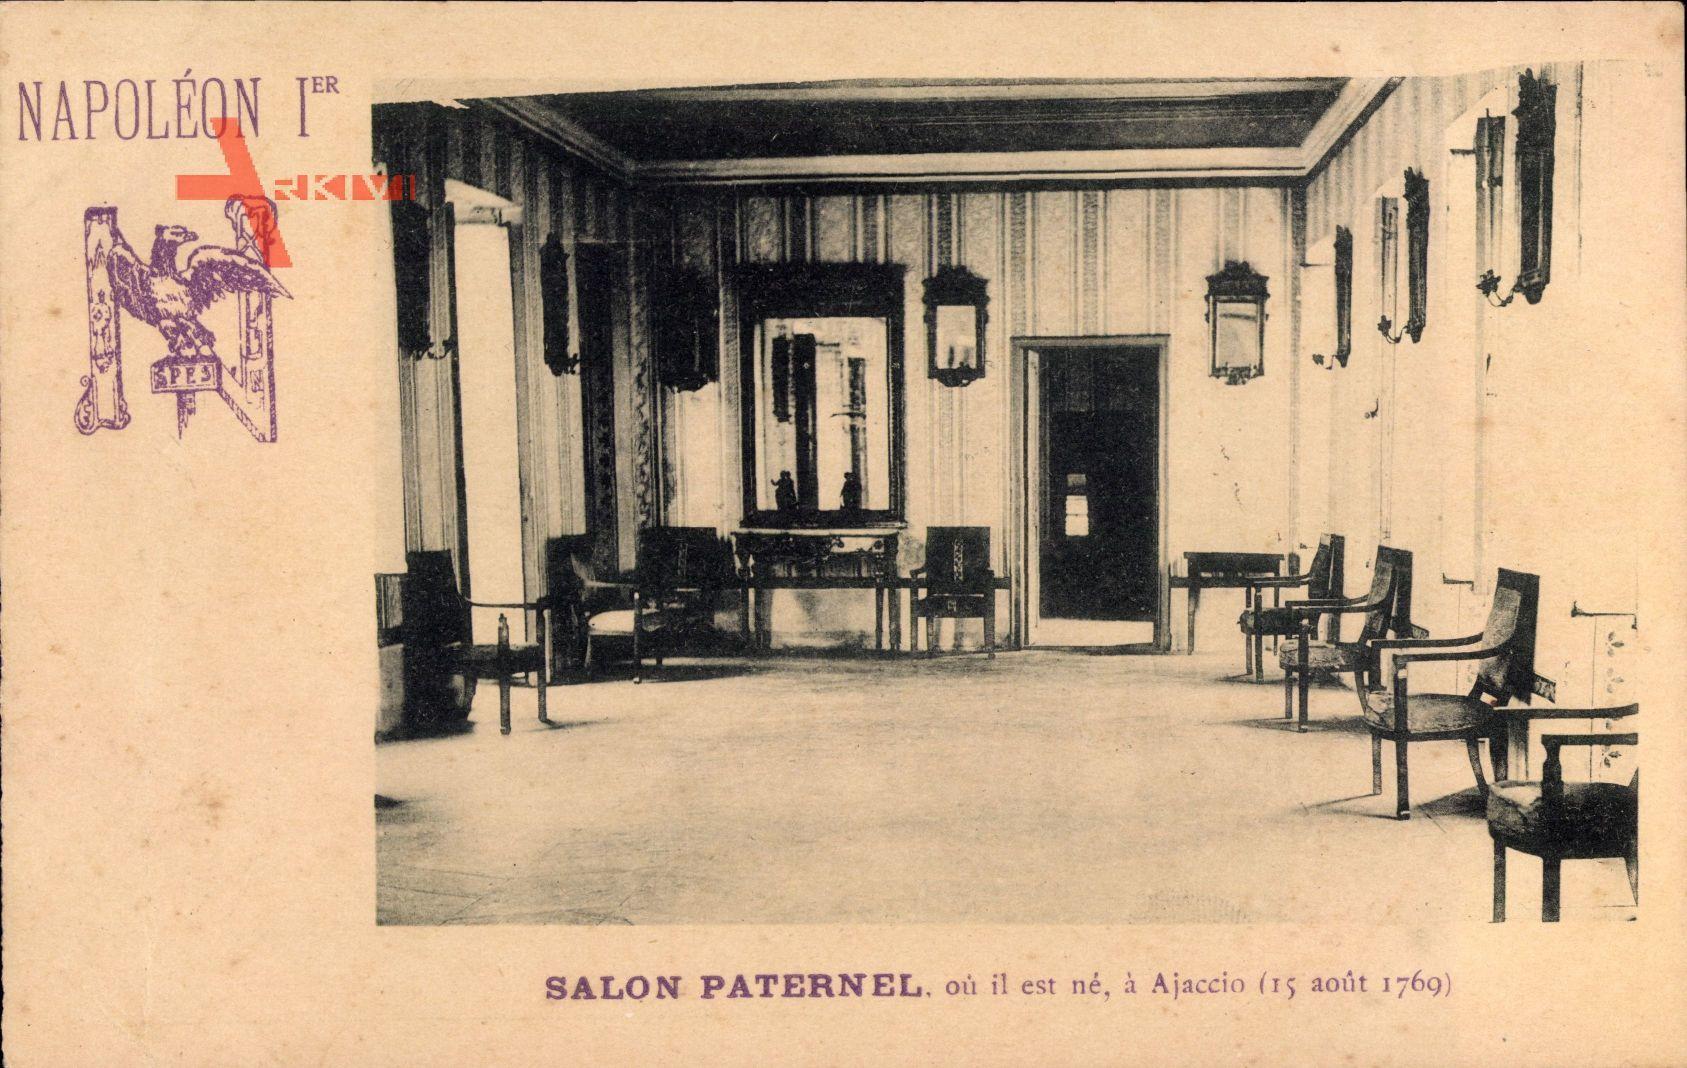 Napoleon Ier, Salon Paternel où il est né, à Ajaccio, 15 août 1769